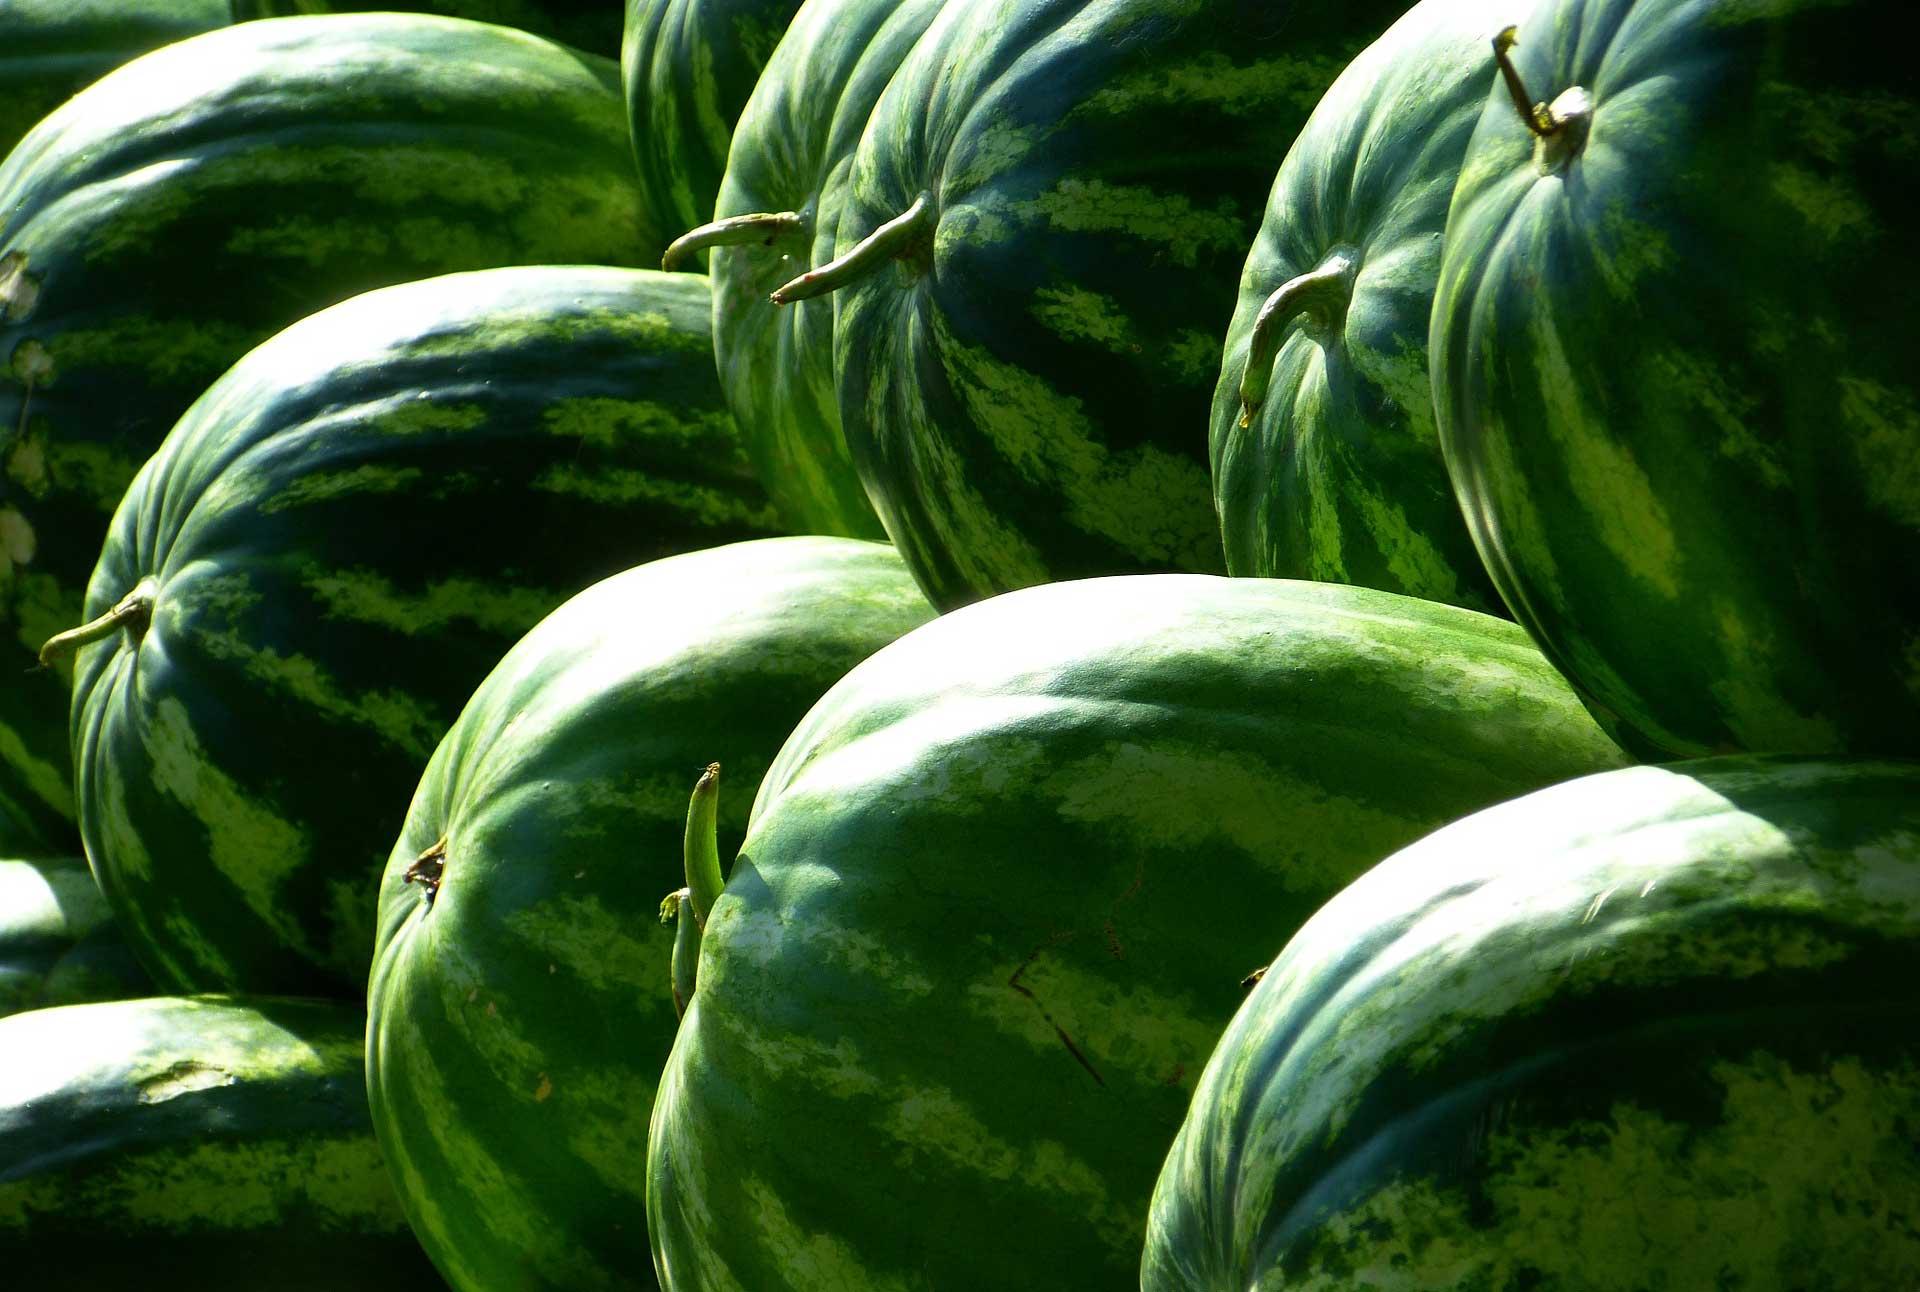 Farmlind Produce - Ironstone Farms